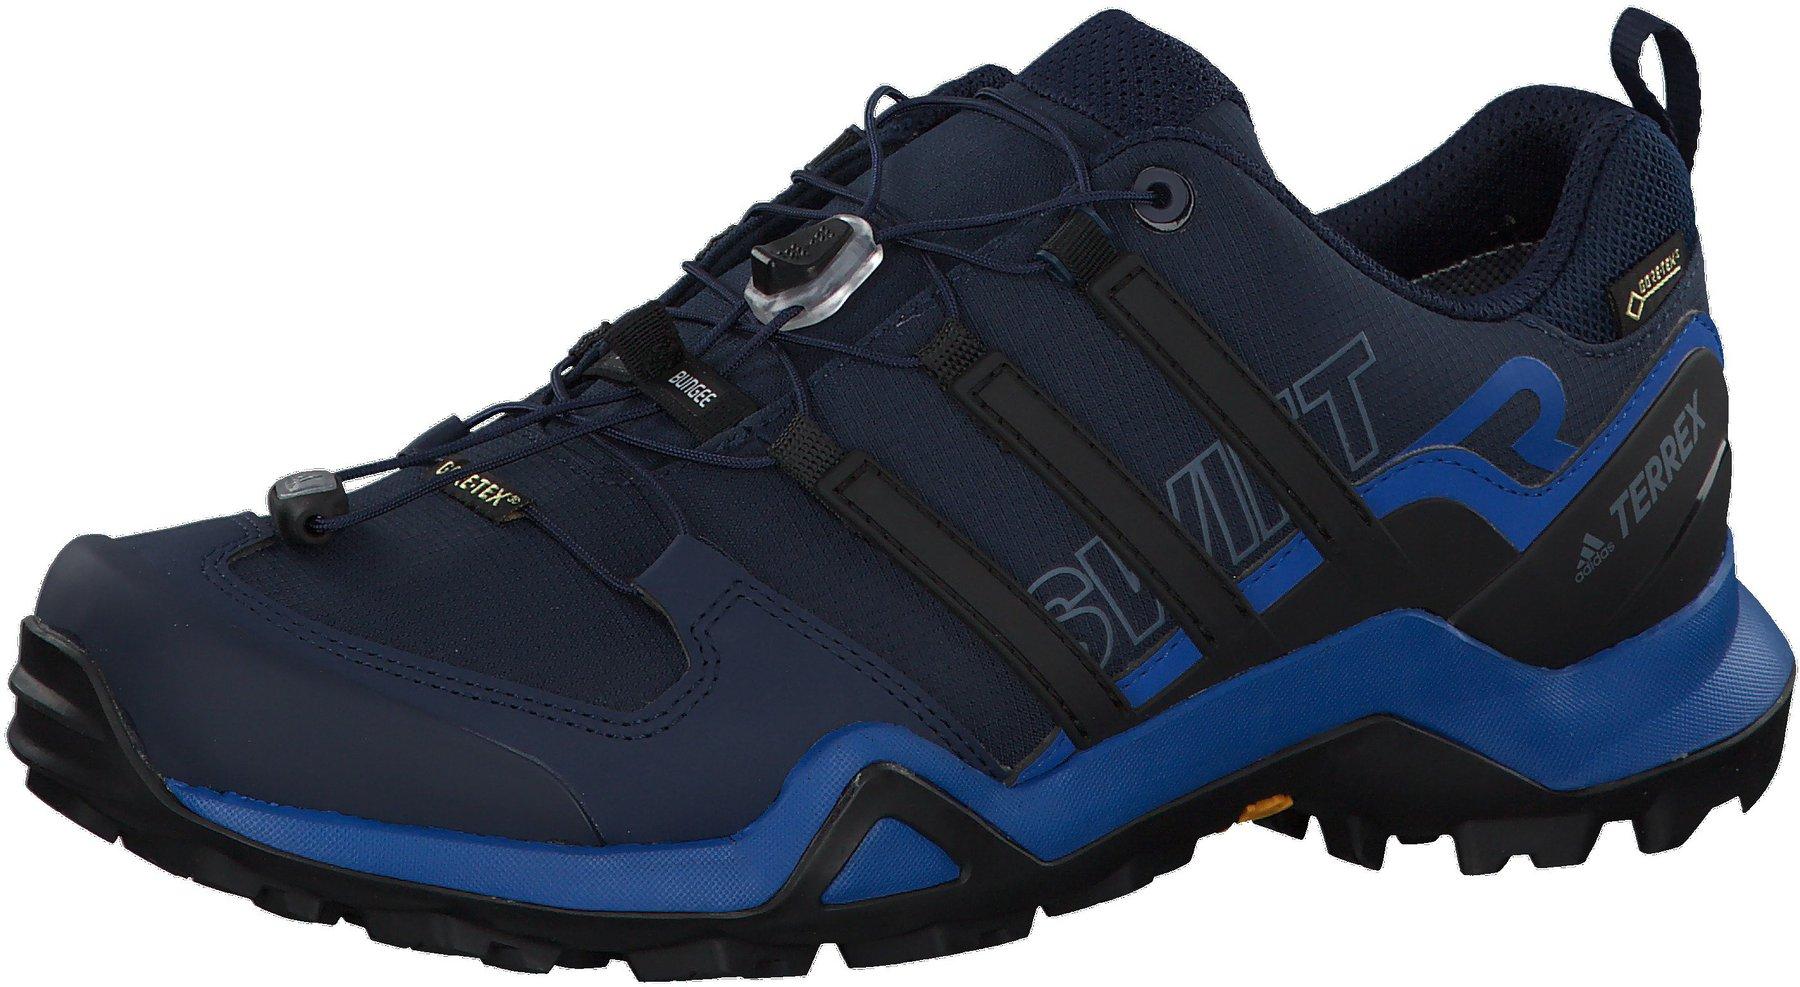 outlet store 07595 ebc5f Adidas Terrex Swift R2 GTX collegiate navy core black blue beauty günstig